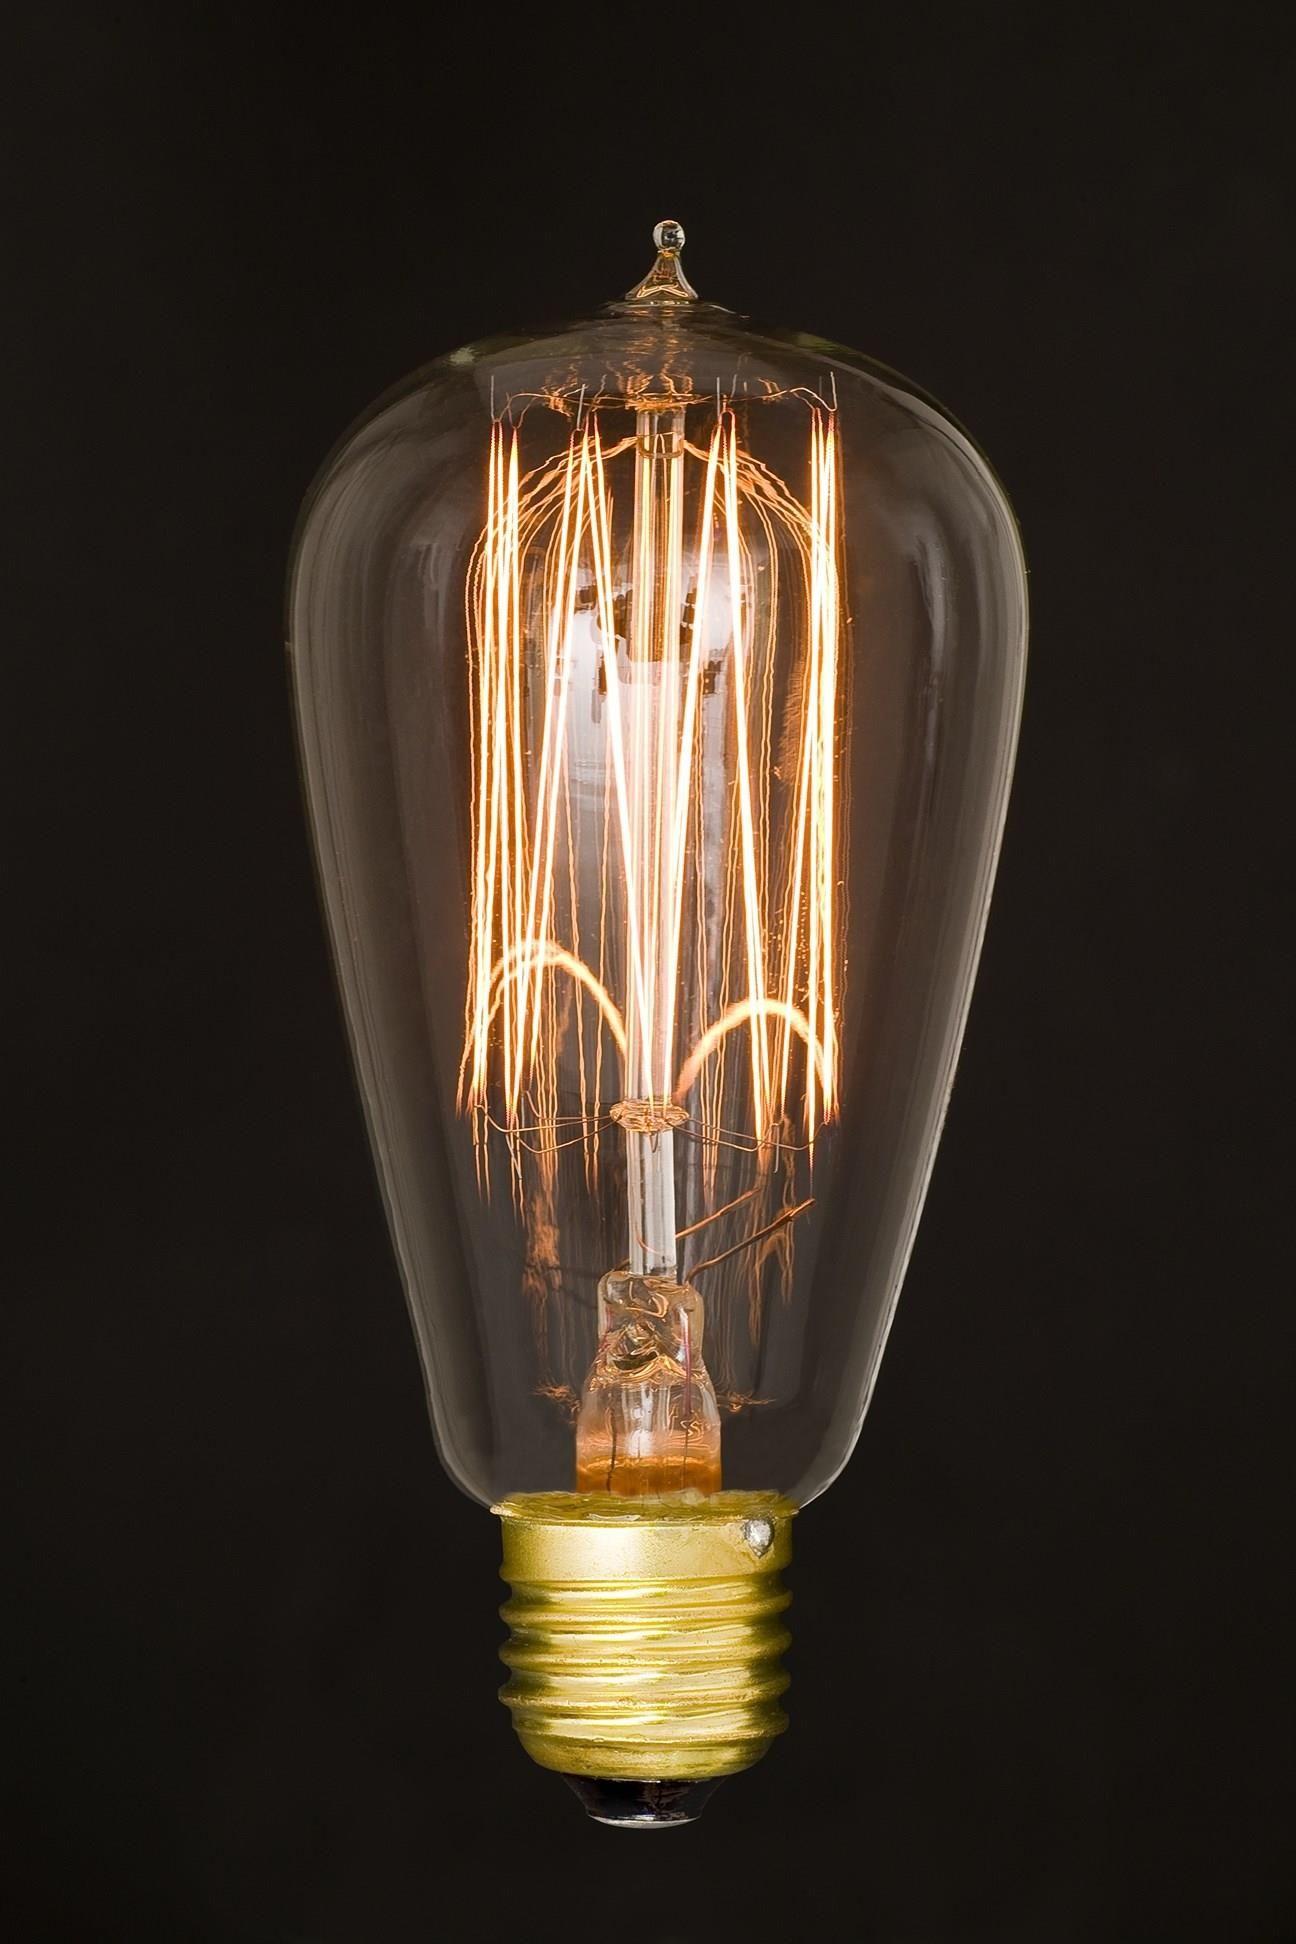 Ozdobna Zarowka Edisona Edison Z Ogonkiem Ceneo Pl Stained Glass Lamps Glass Lamp Edison Light Bulbs